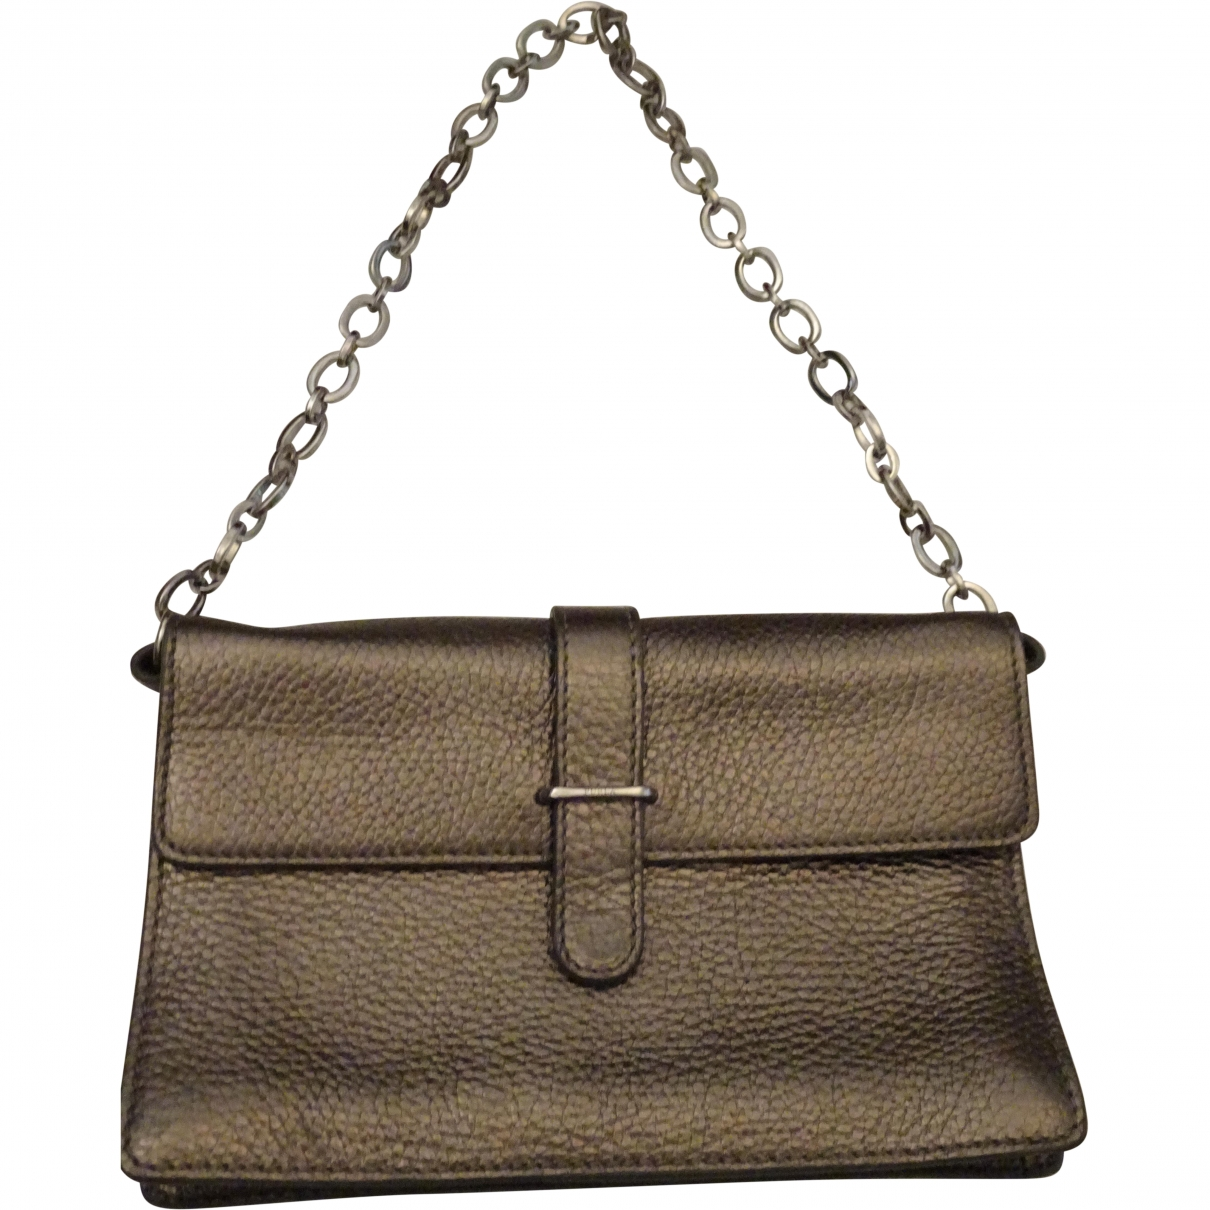 Furla \N Metallic Leather handbag for Women \N